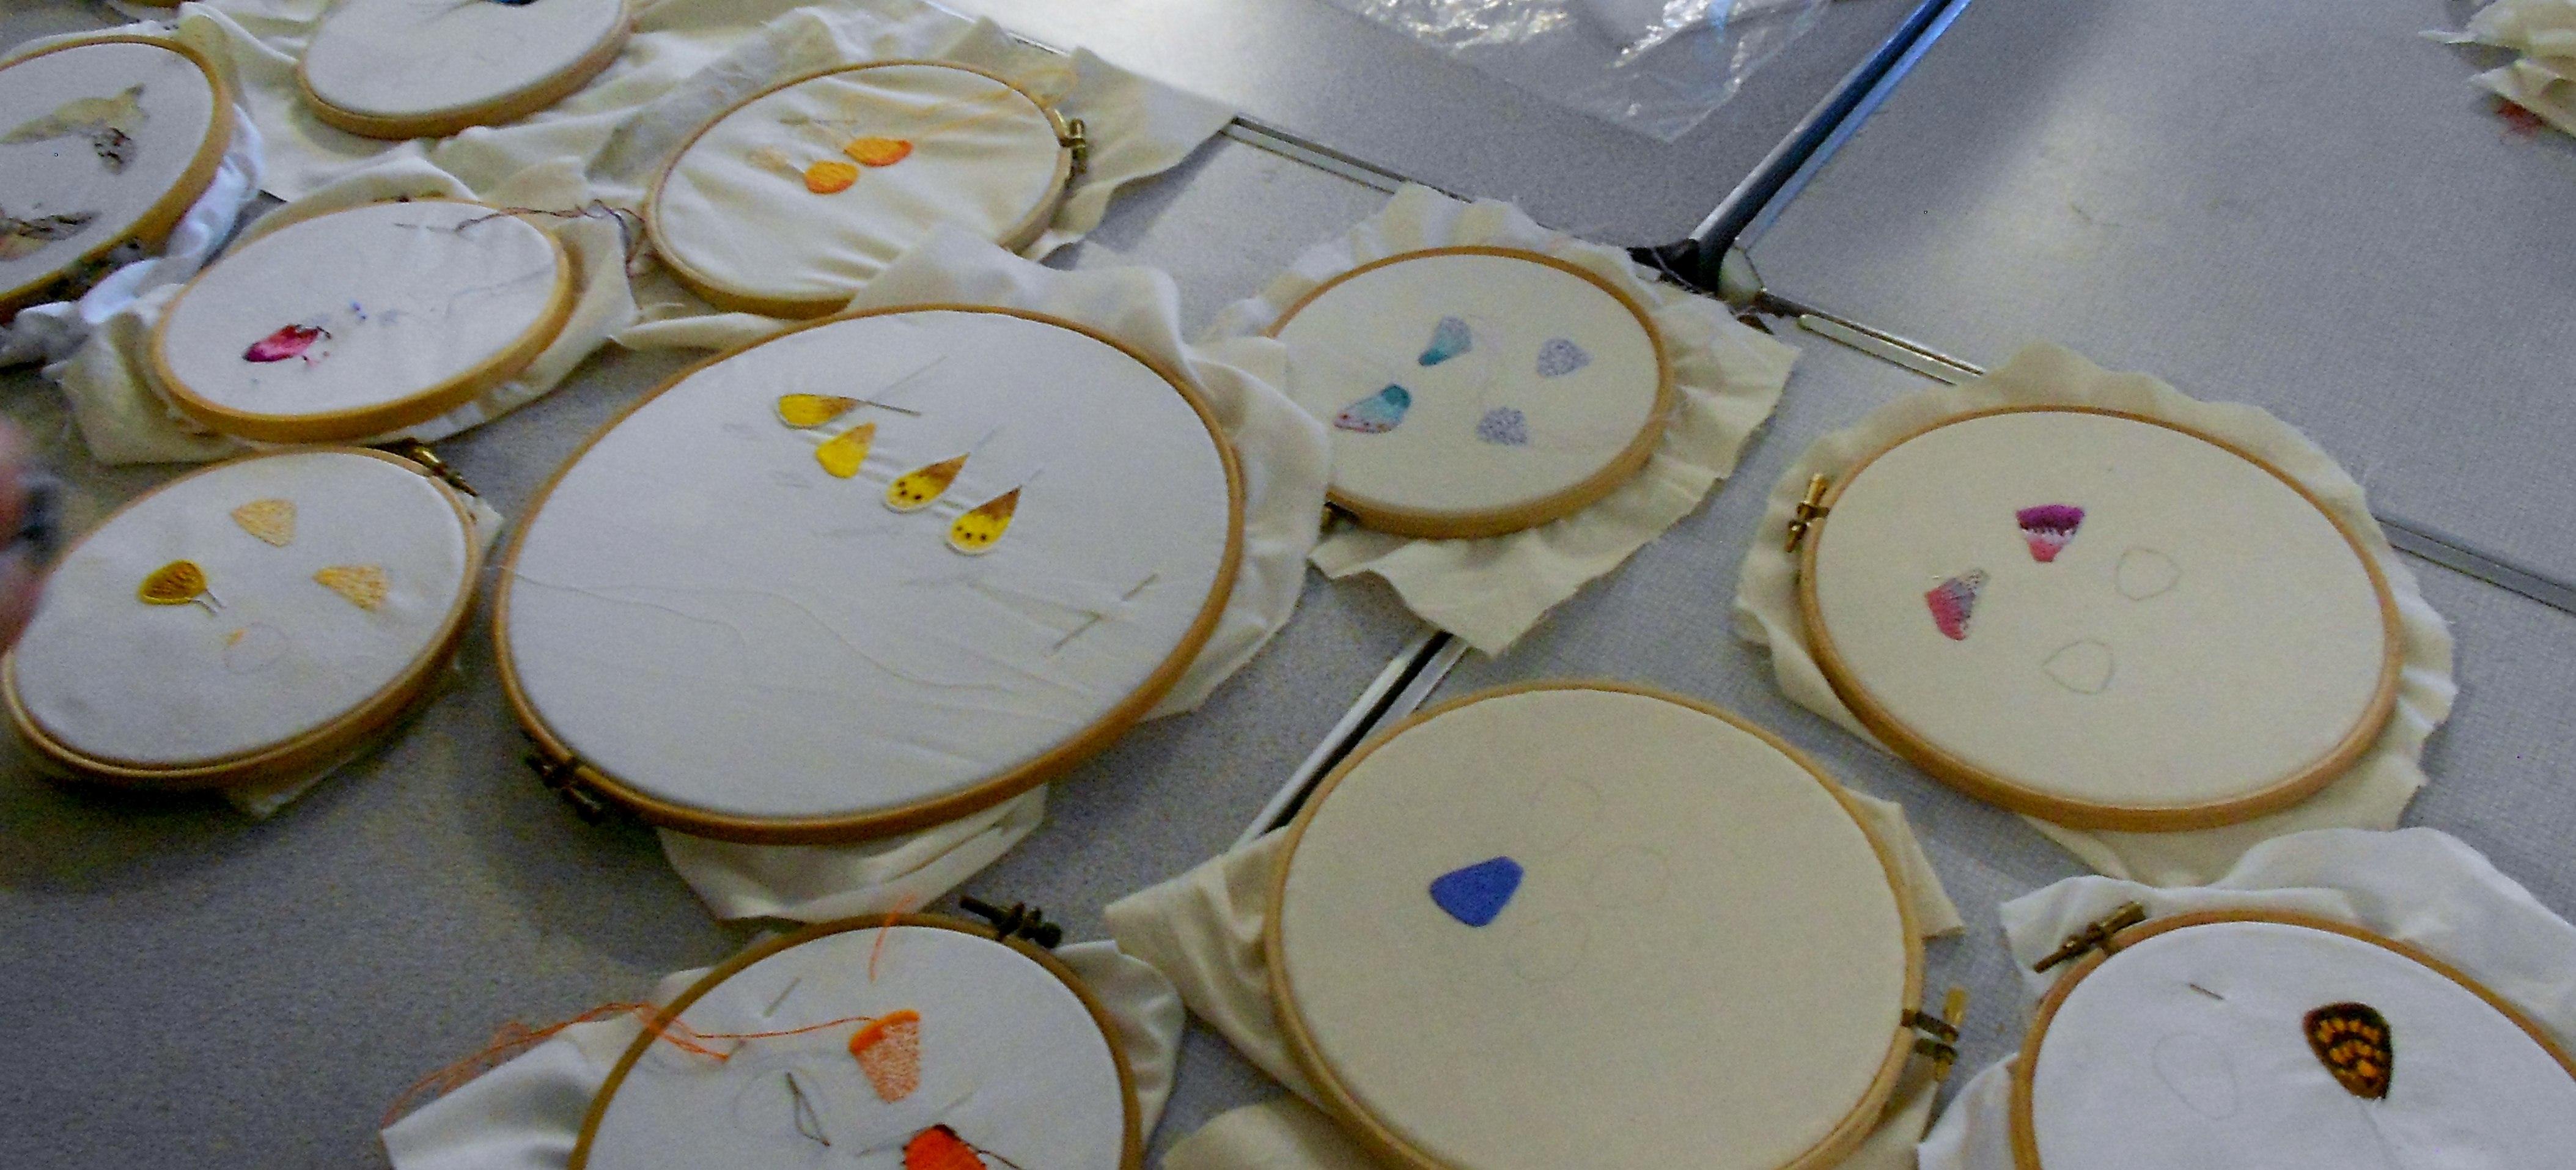 Students sample stumpwork butterfly workshop